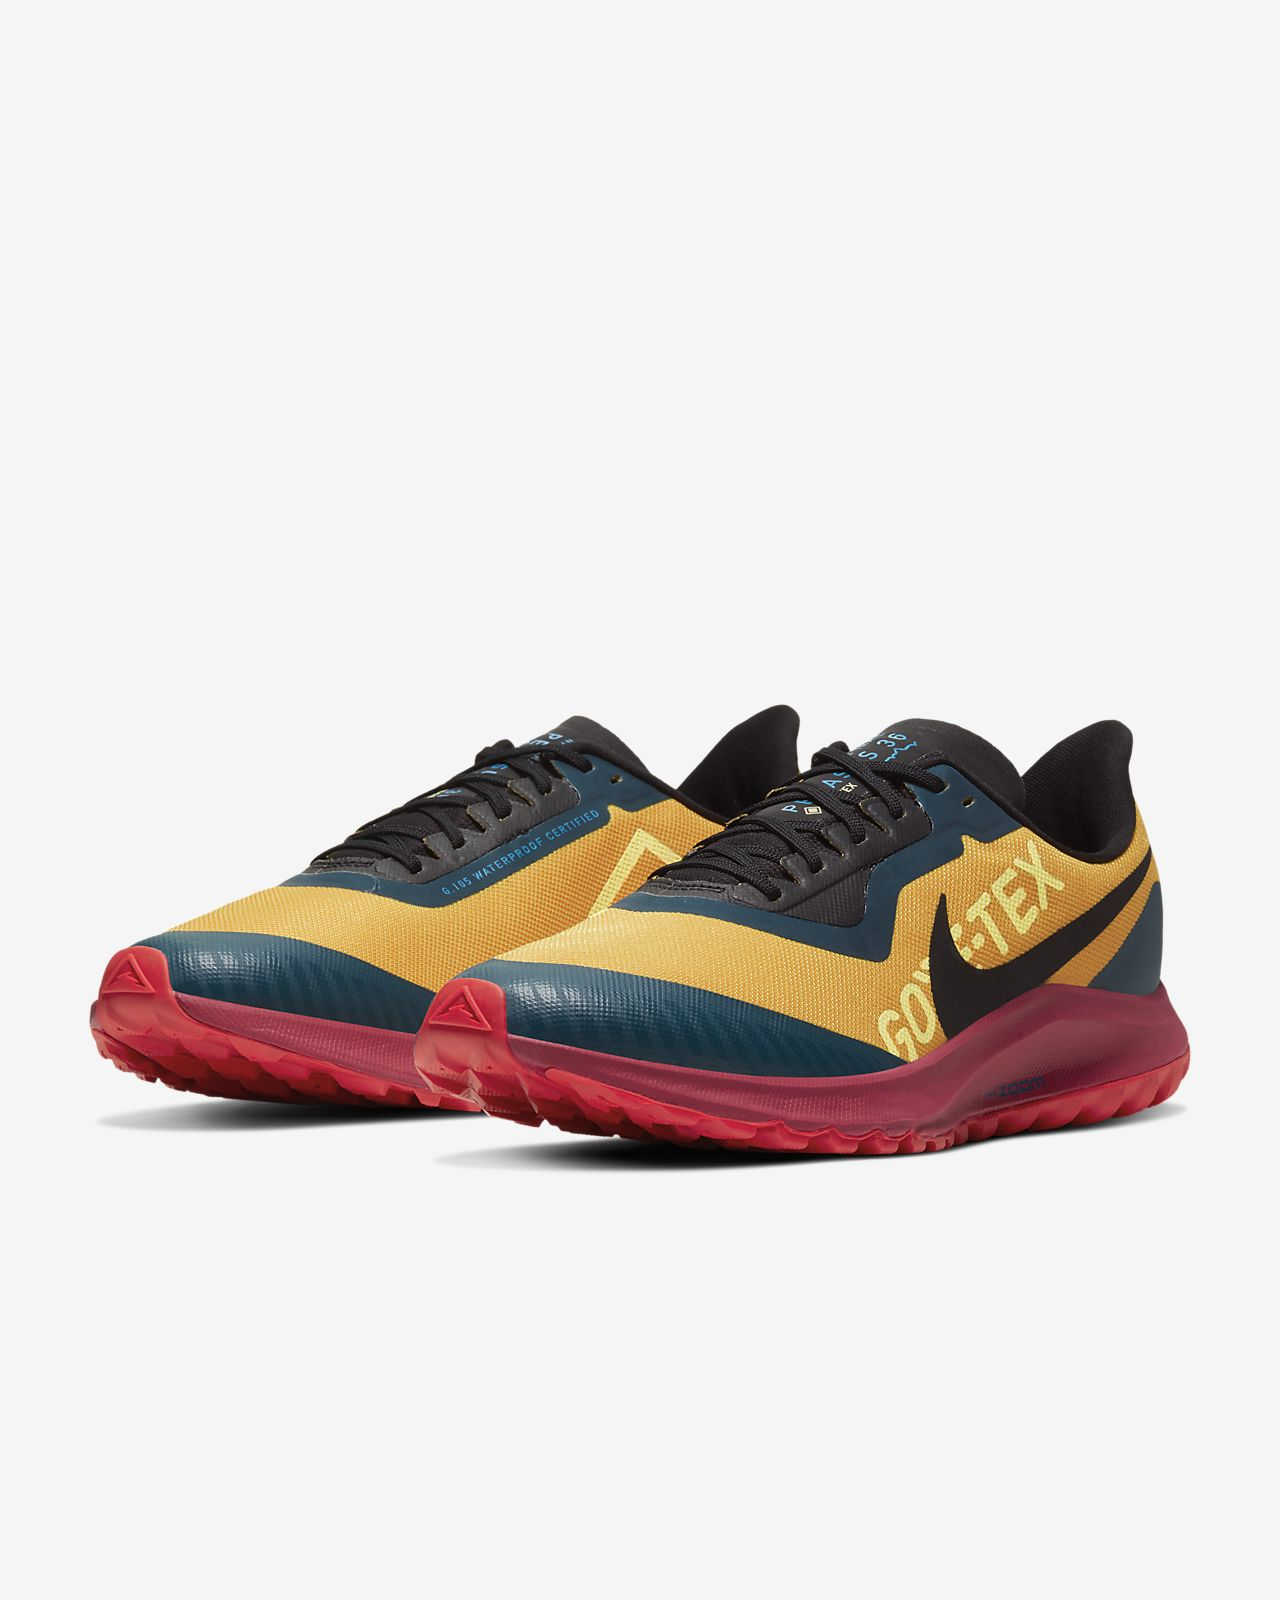 Chaussures de trail running femme Zoom Pegasus 36 Trail Gore